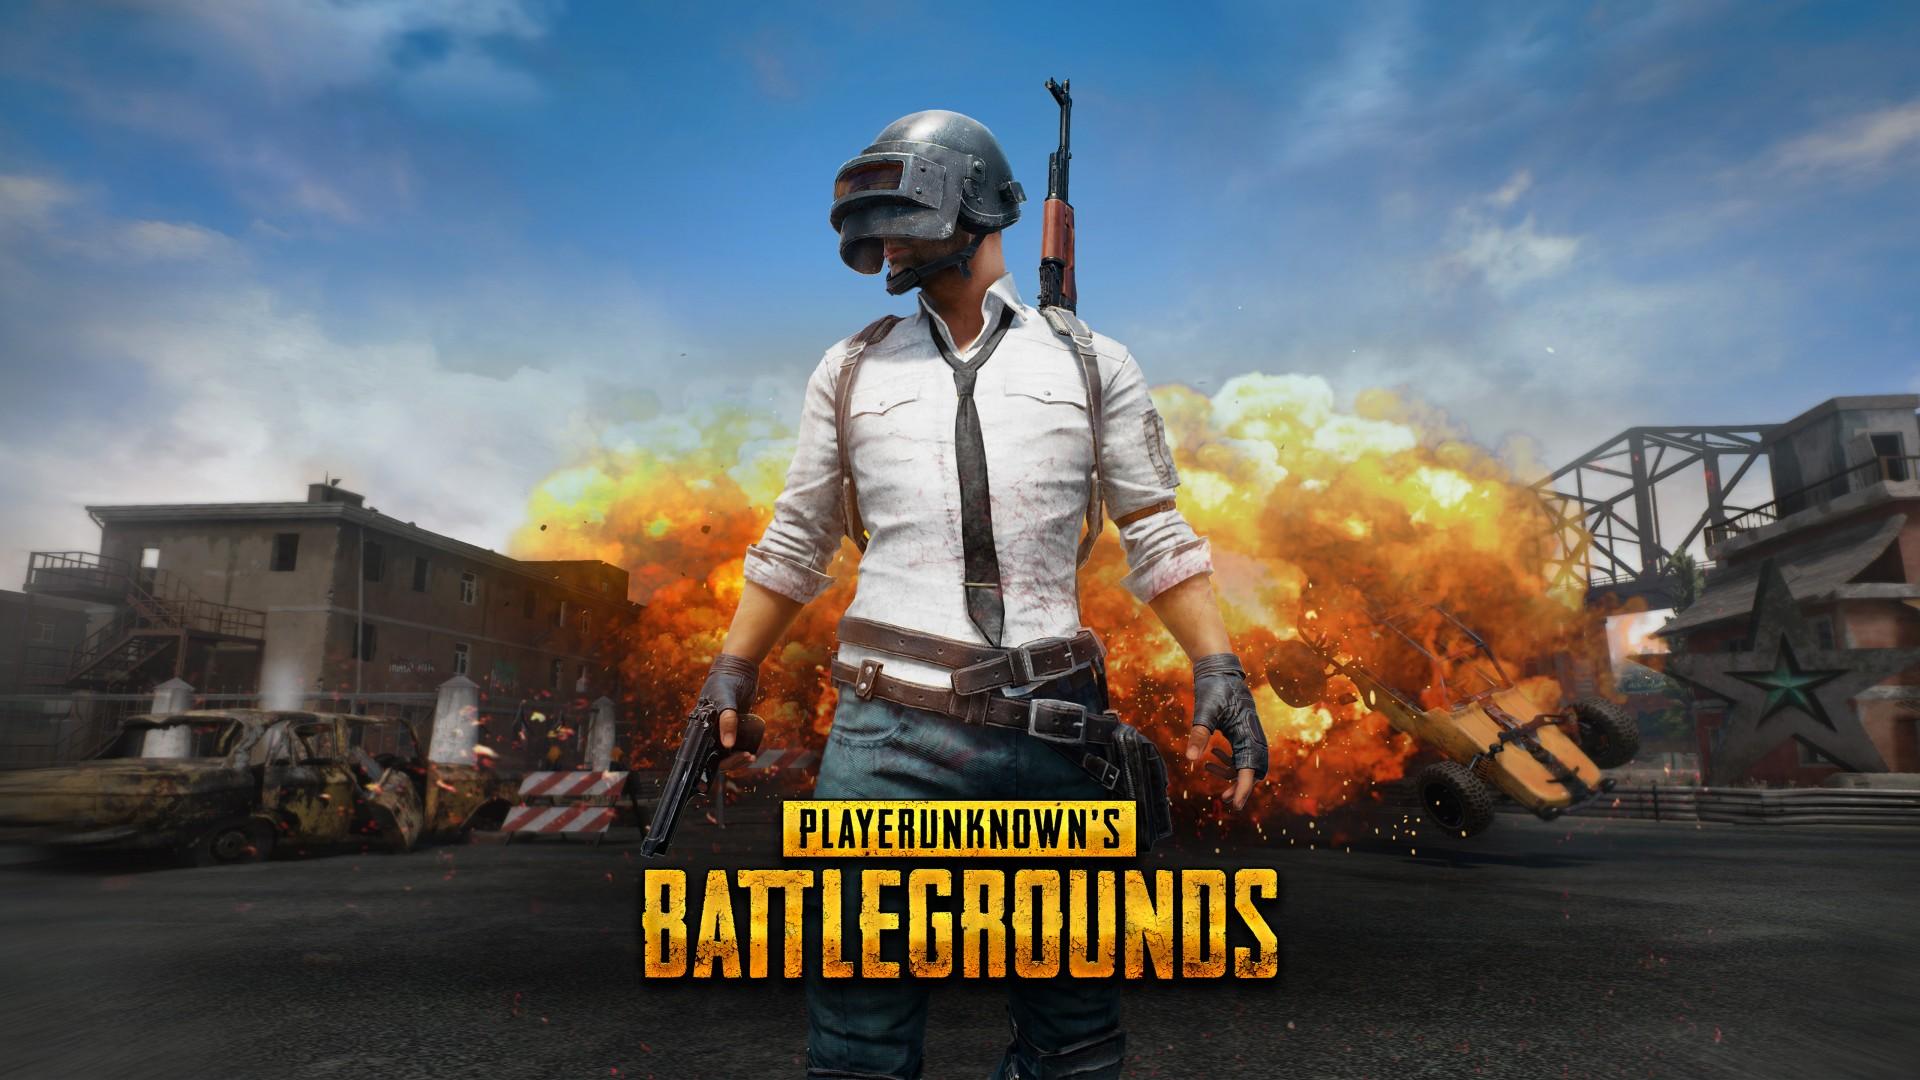 Bluehole Studio: لن نضيف صناديق الغنيمة للعبة PlayerUnknown's Battlegrounds إن كانت تؤثر على اللعب!